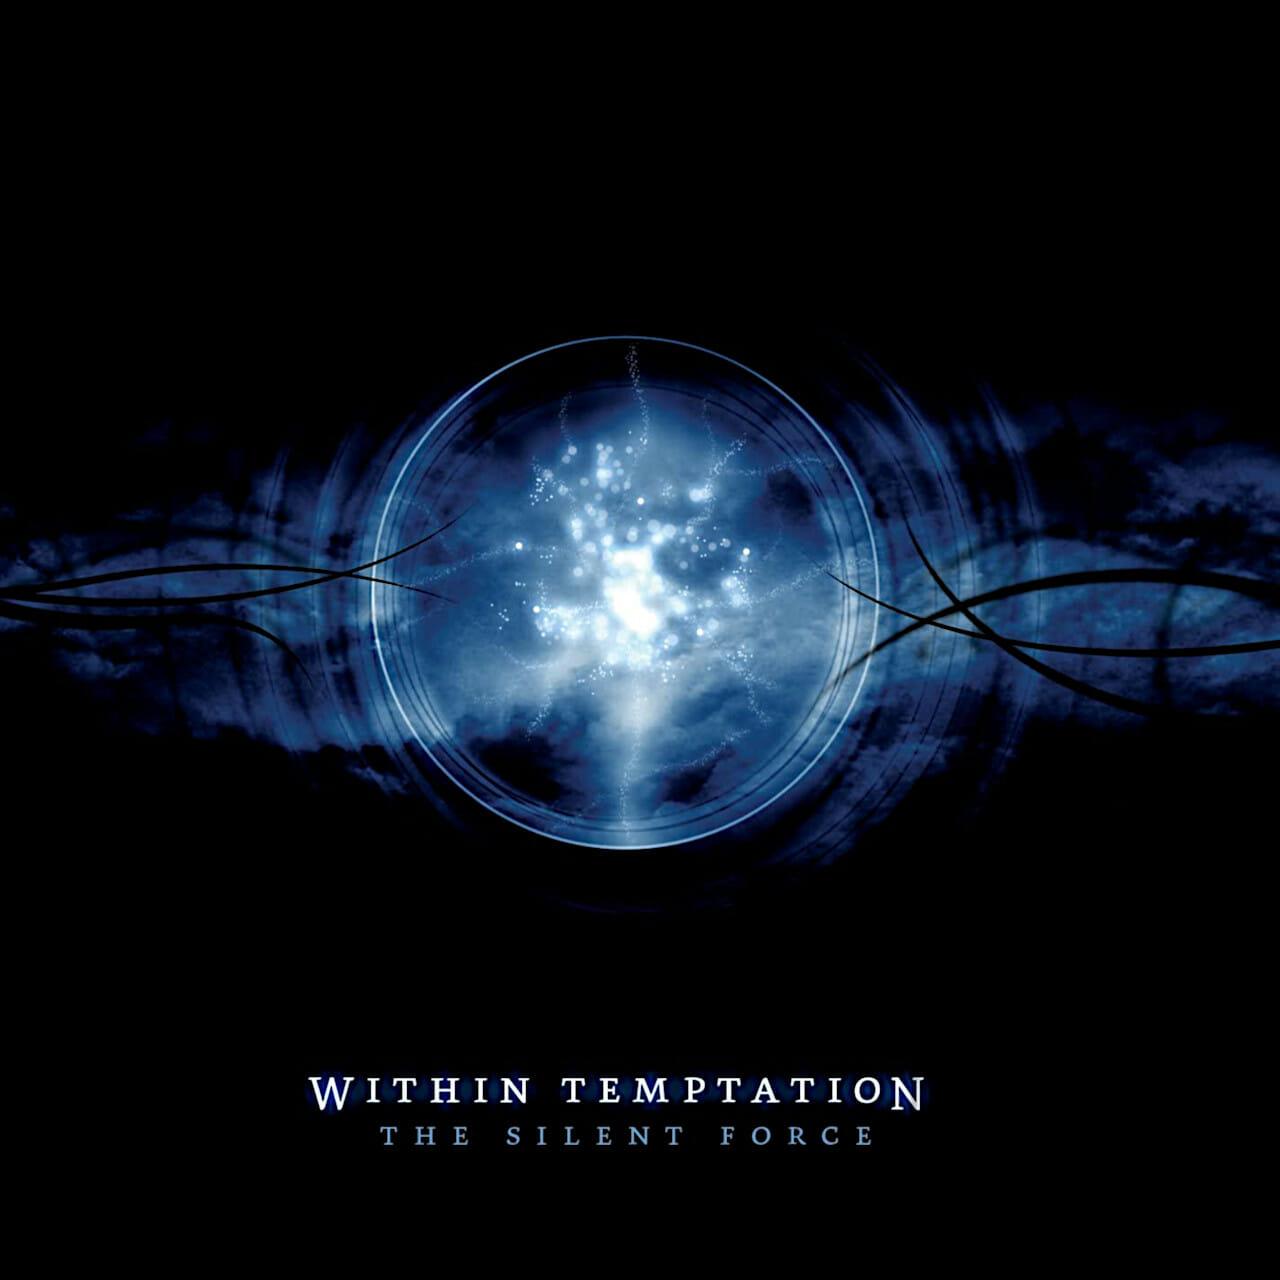 Within Temptation Album Silent Force